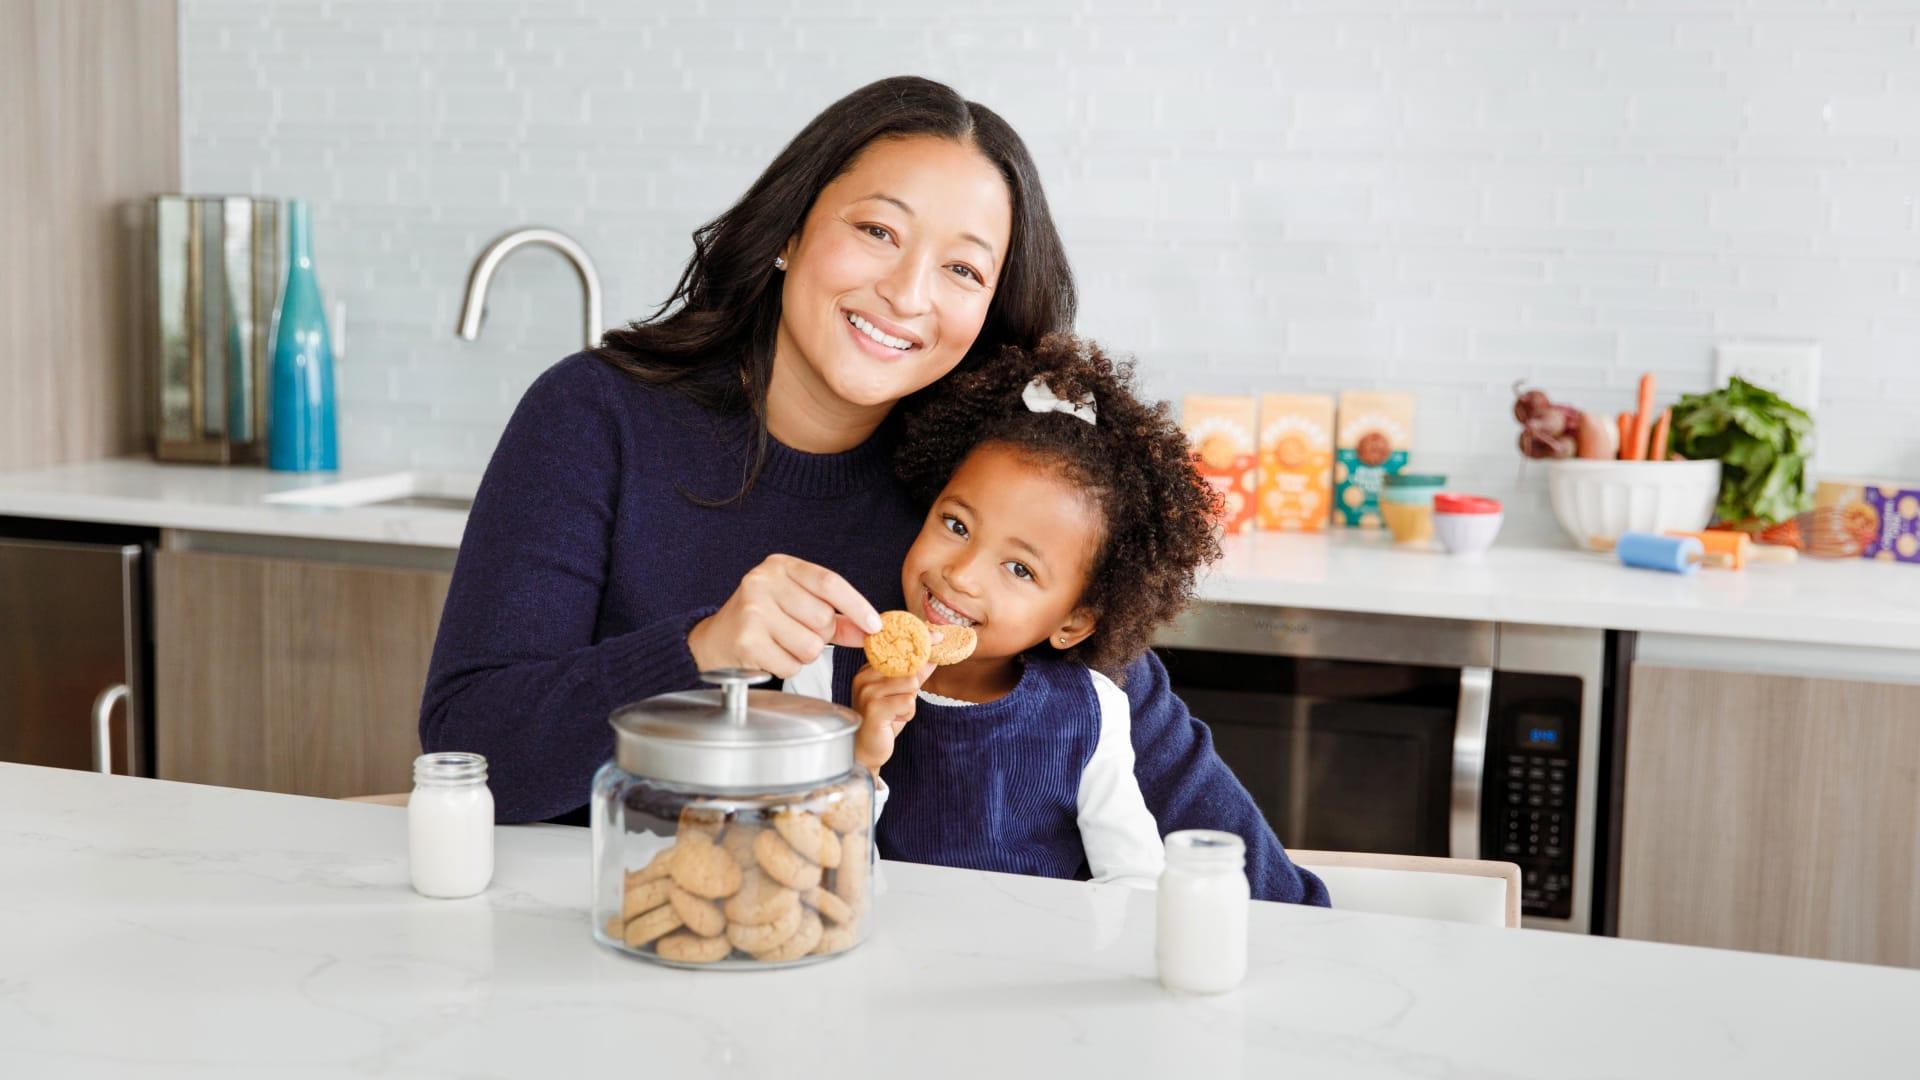 Denise Woodard with her daughter, Vivienne.